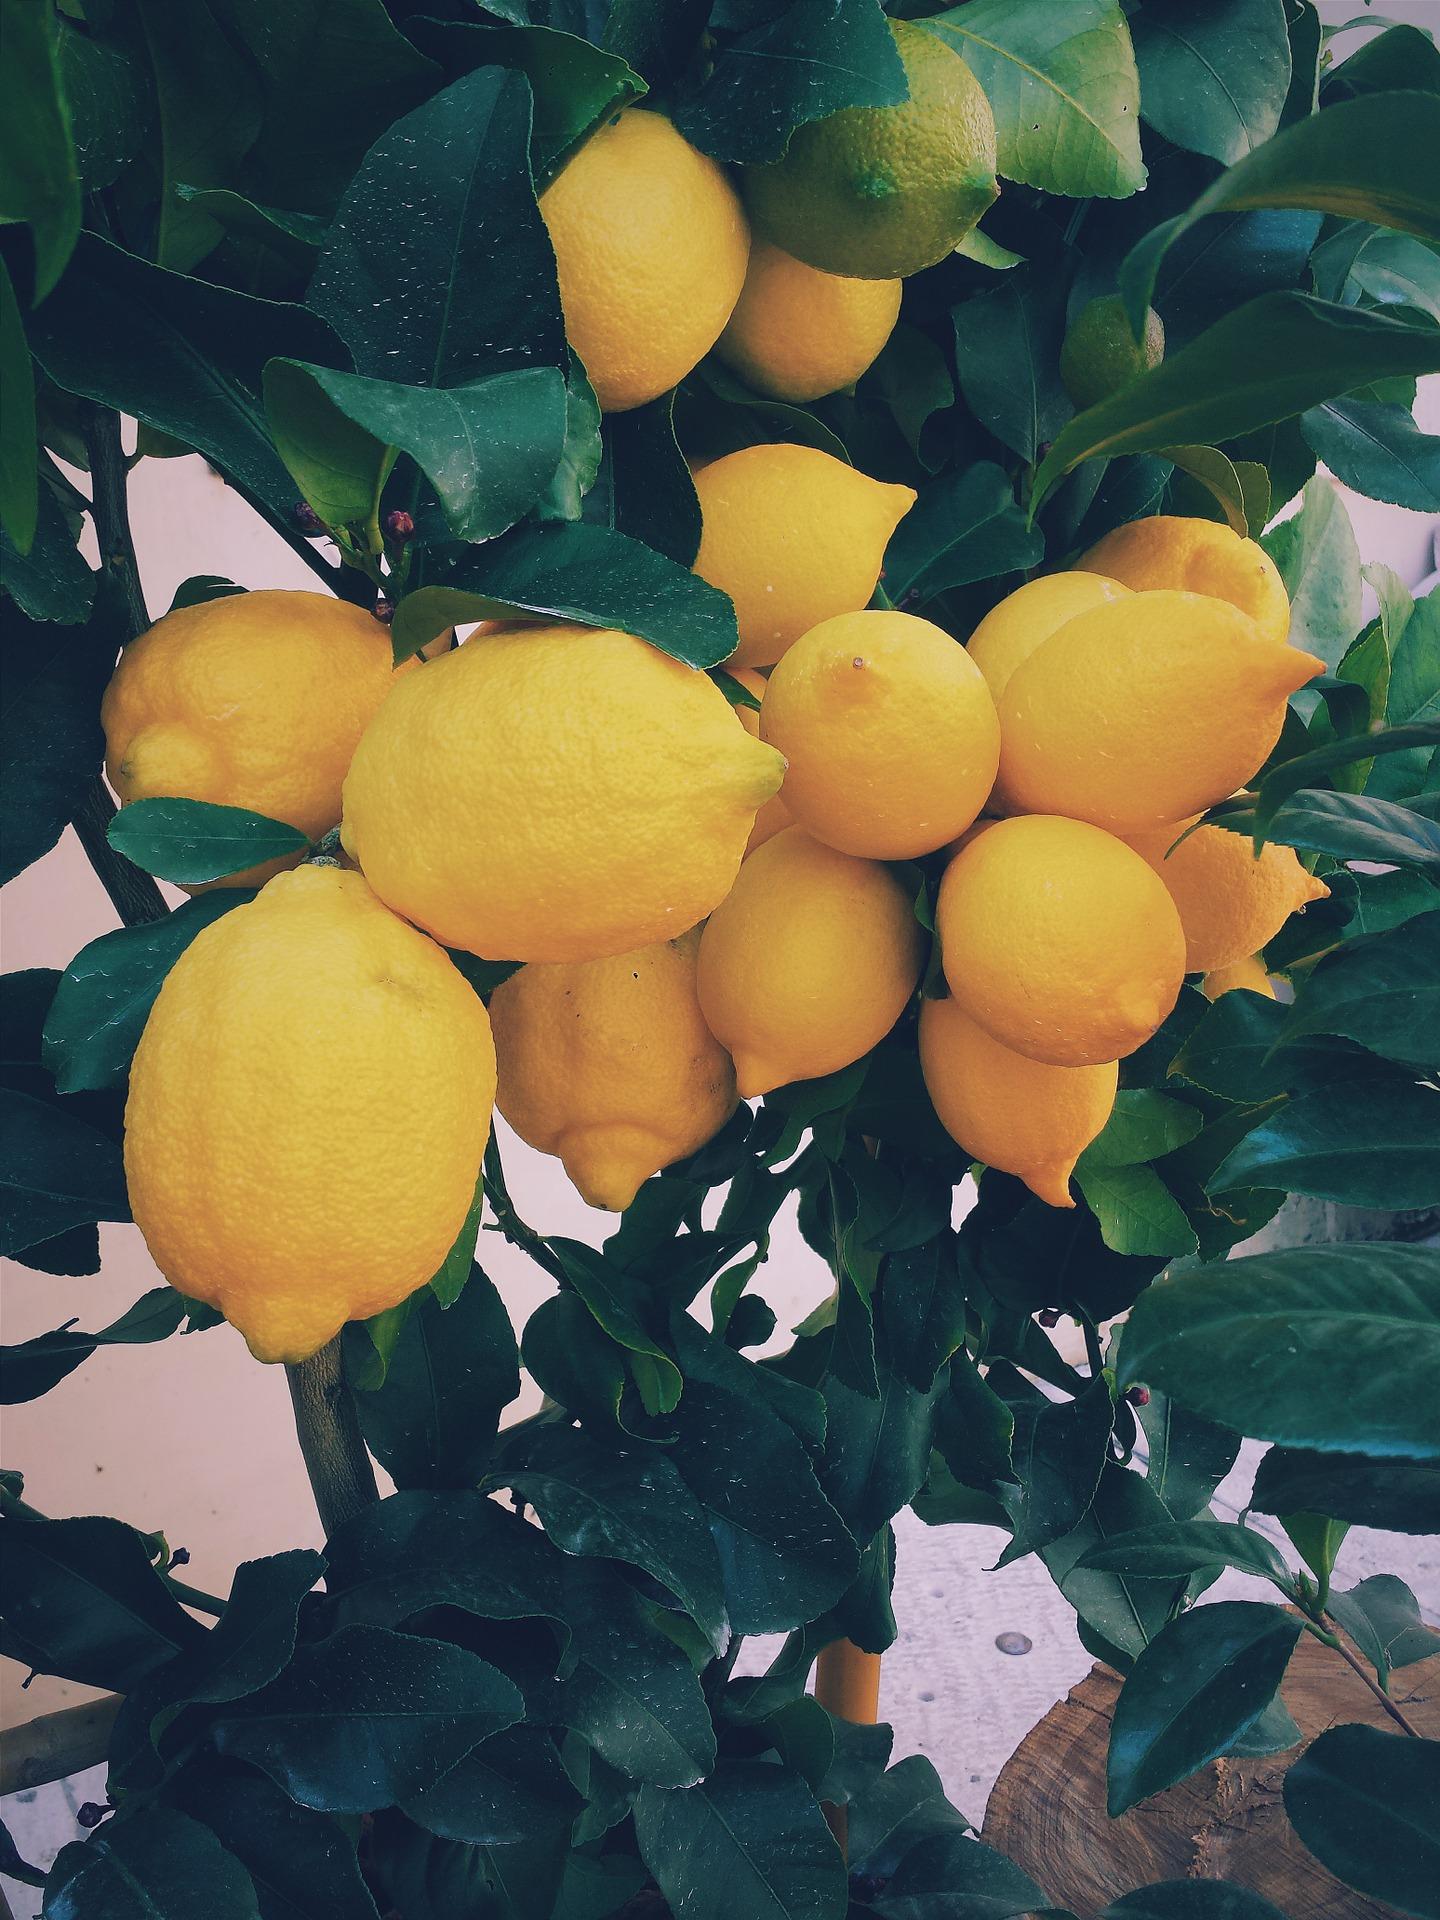 lemon-tree-801996_1920.jpg